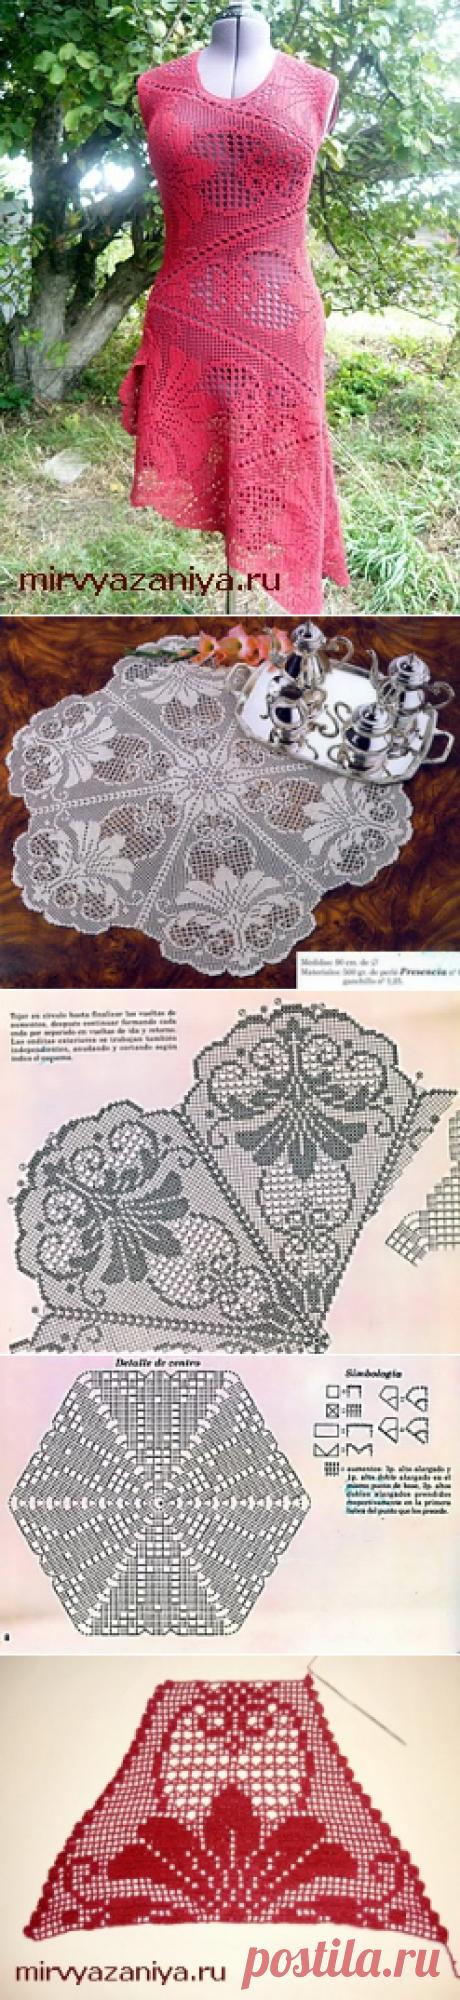 Филейное платье на основе салфетки филе.